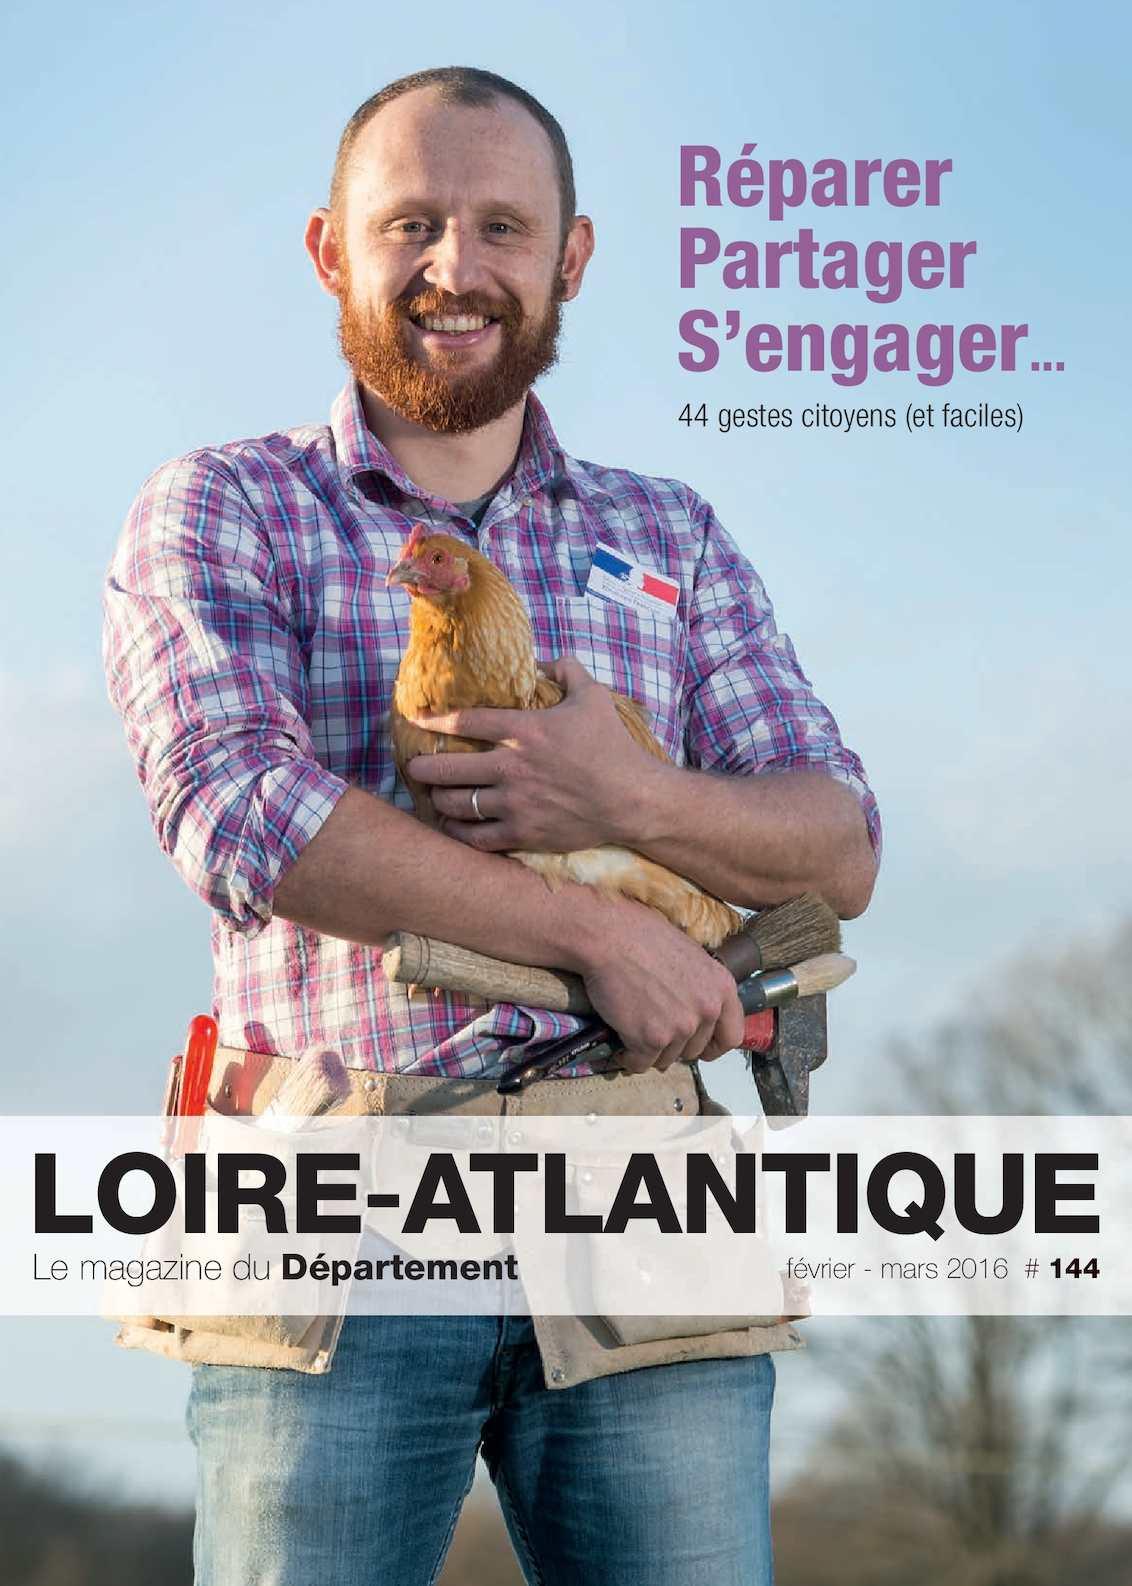 Calam o mag144 loire atlantique f vrier mars 2016 for Garage ad loire atlantique